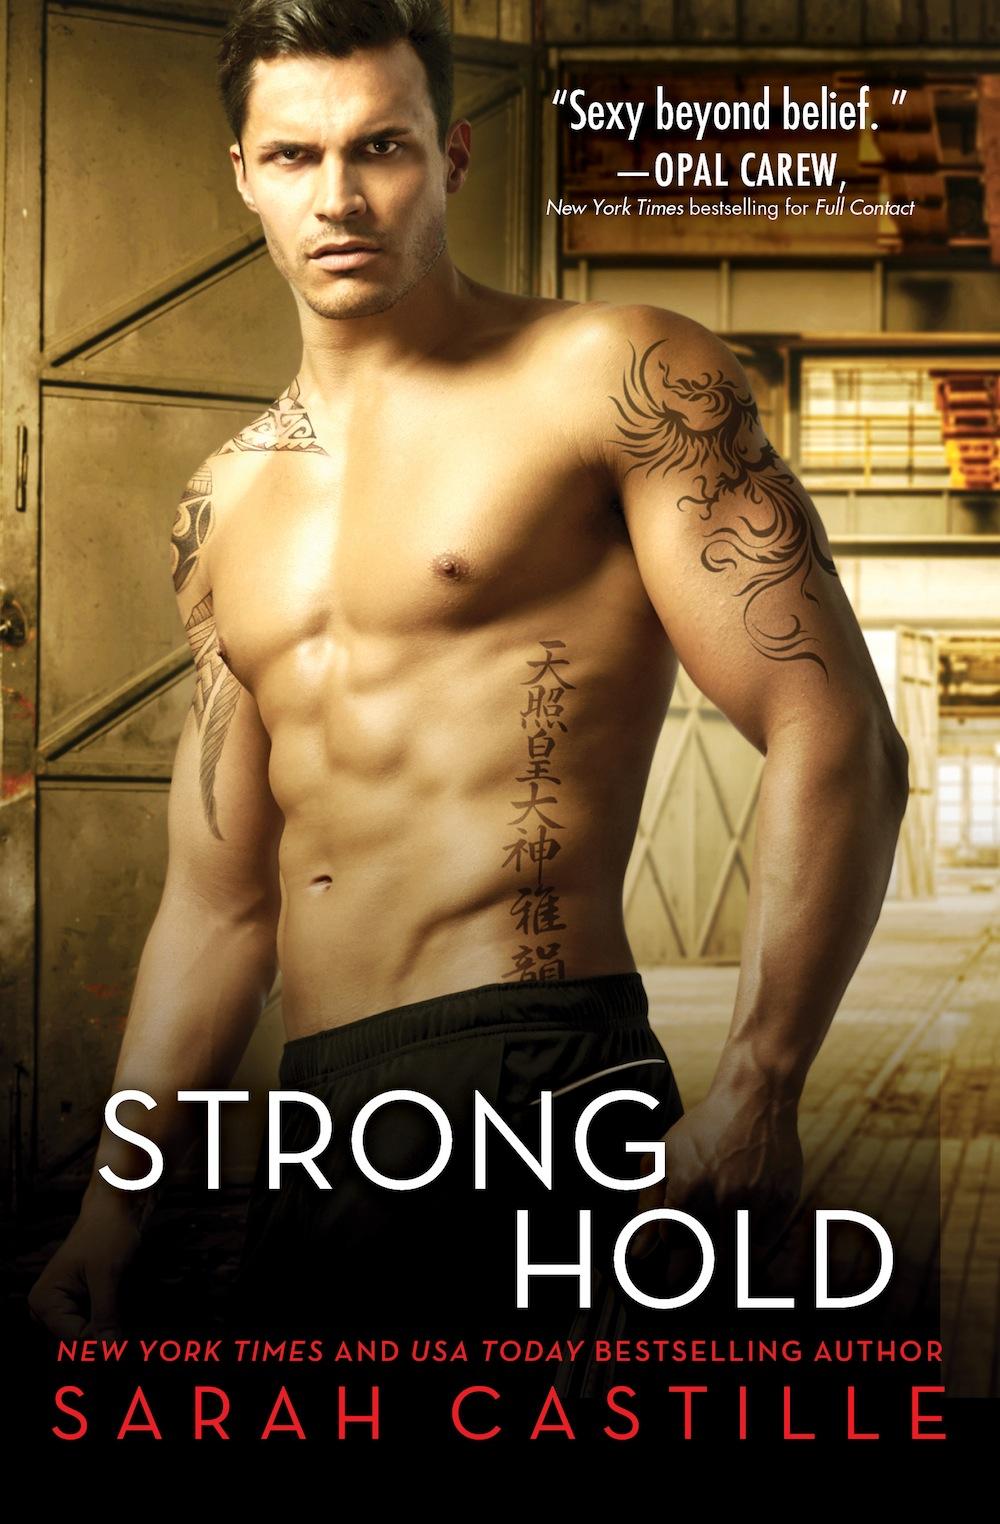 StrongHold.JPG